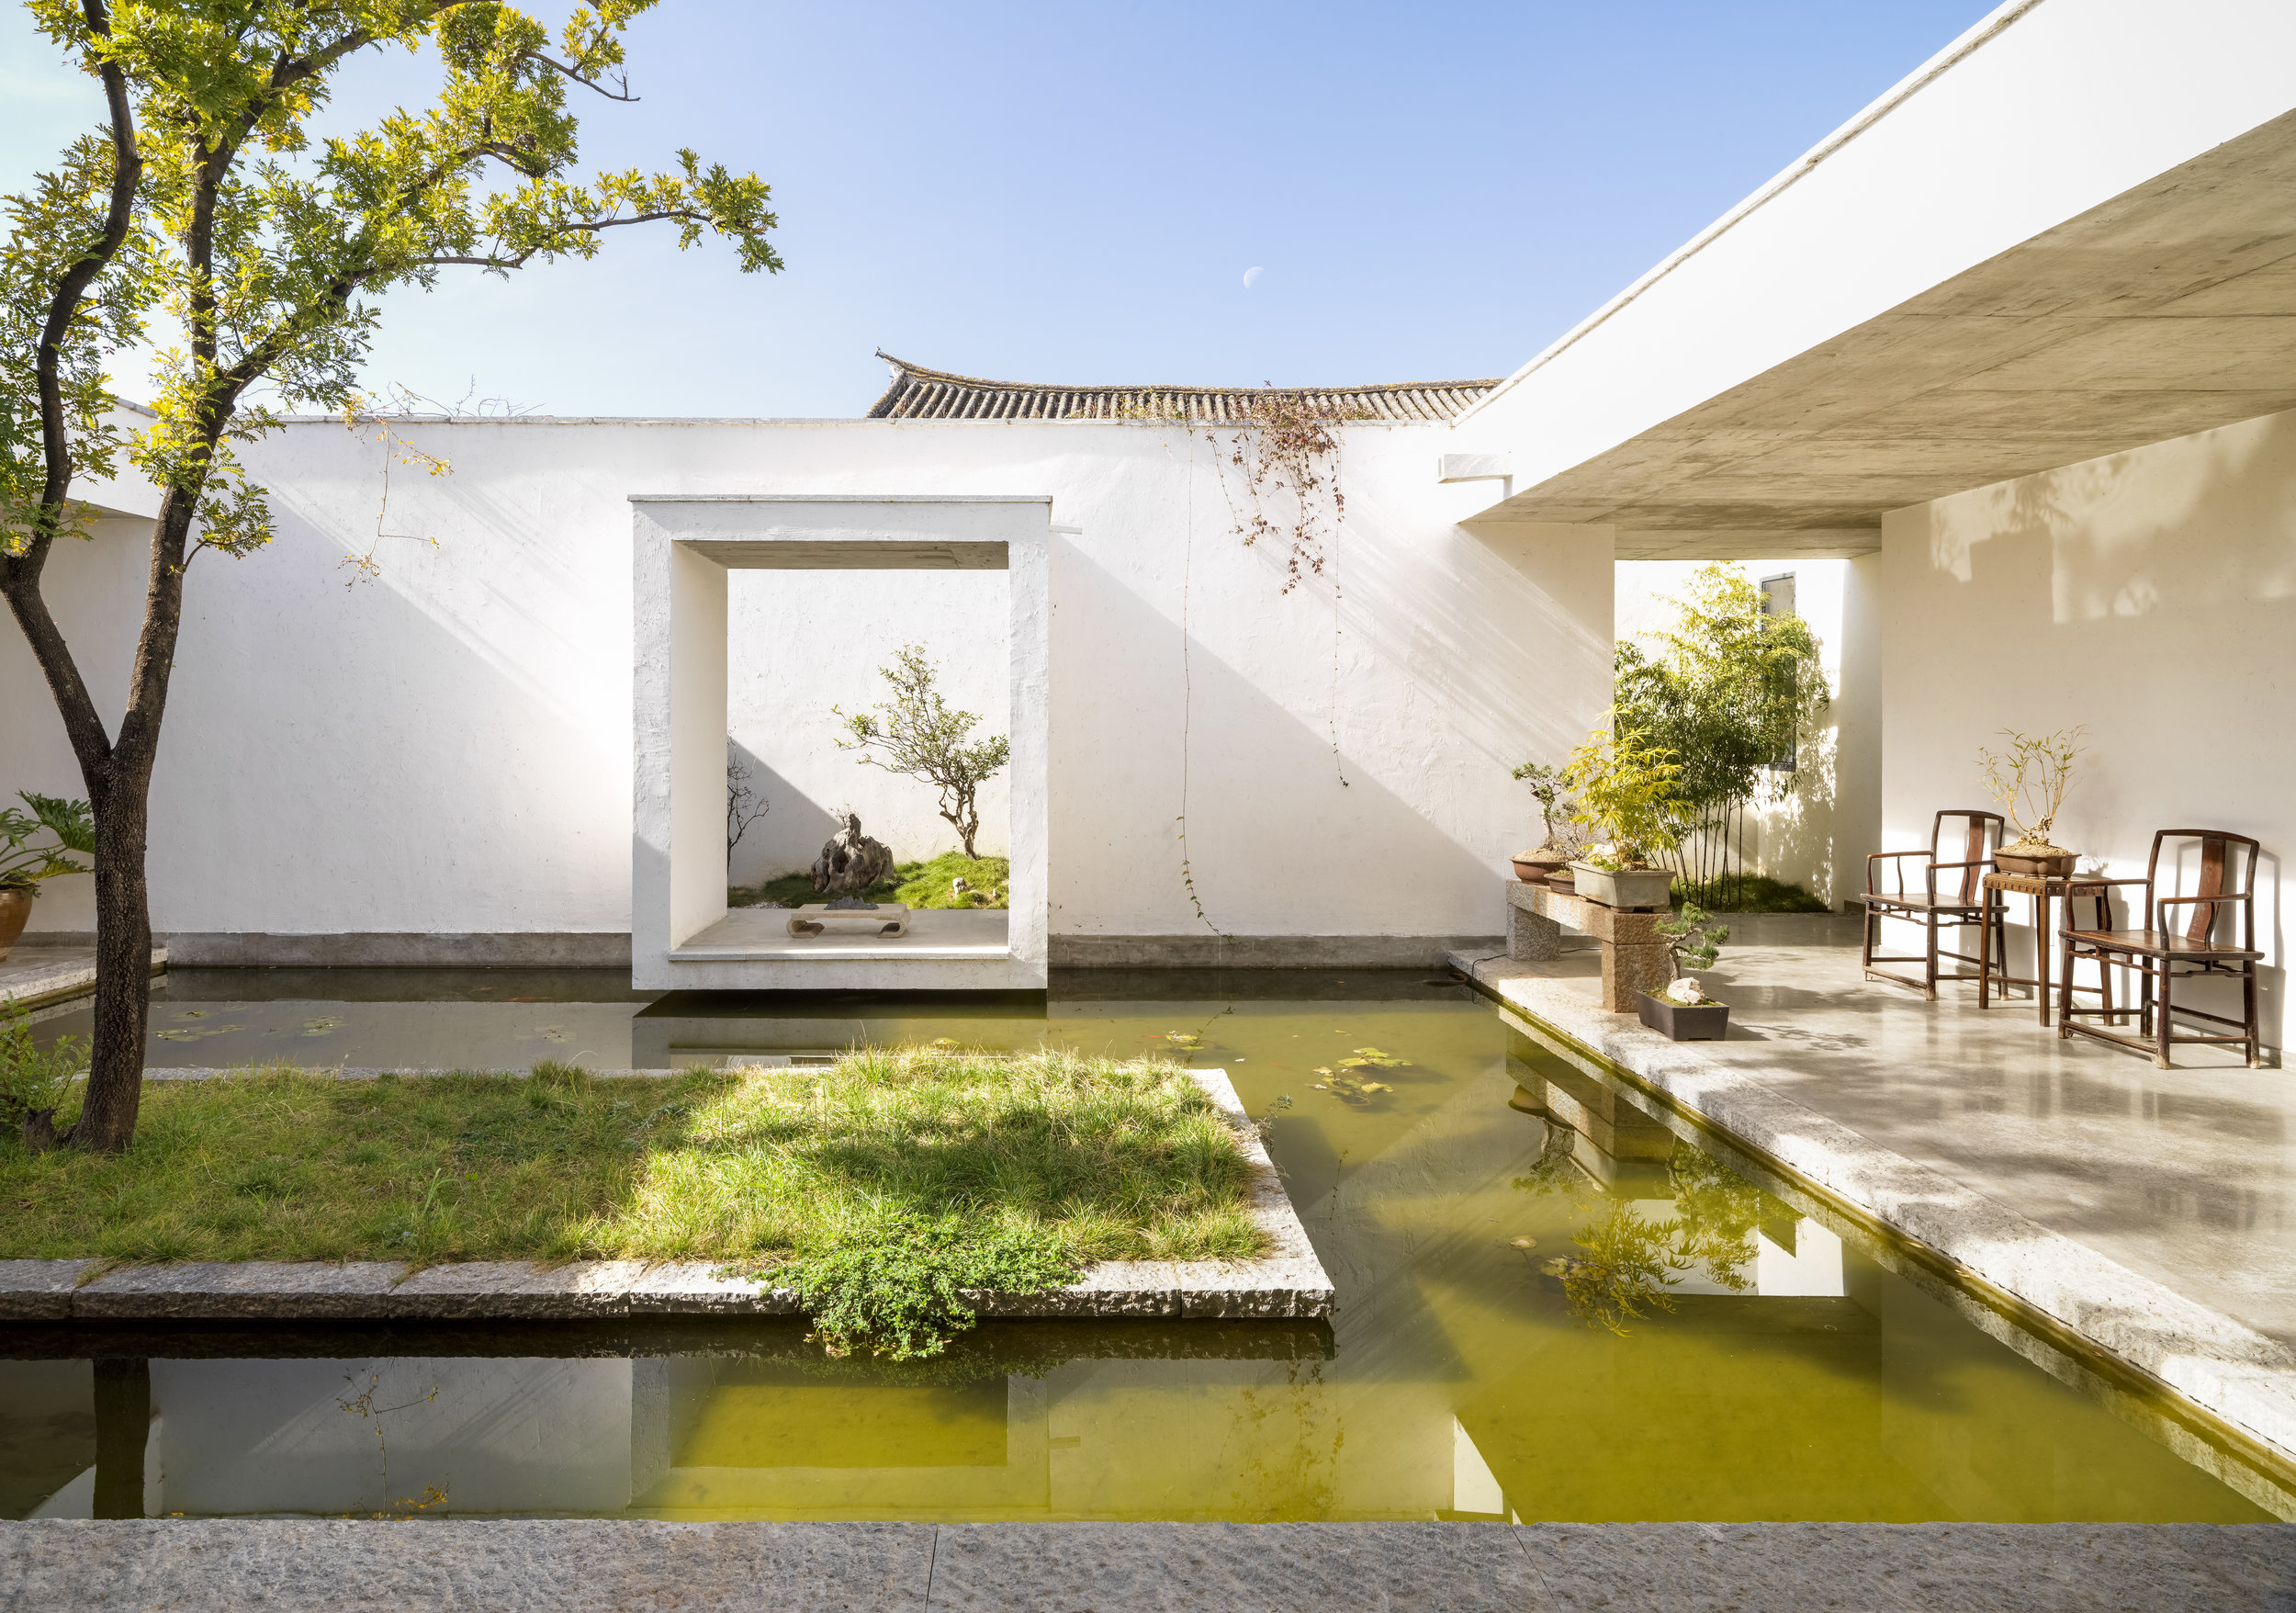 2017.01.21_Zhao_Yang_Architects_Dali_Zhu_An_0009_HI-RES.jpg